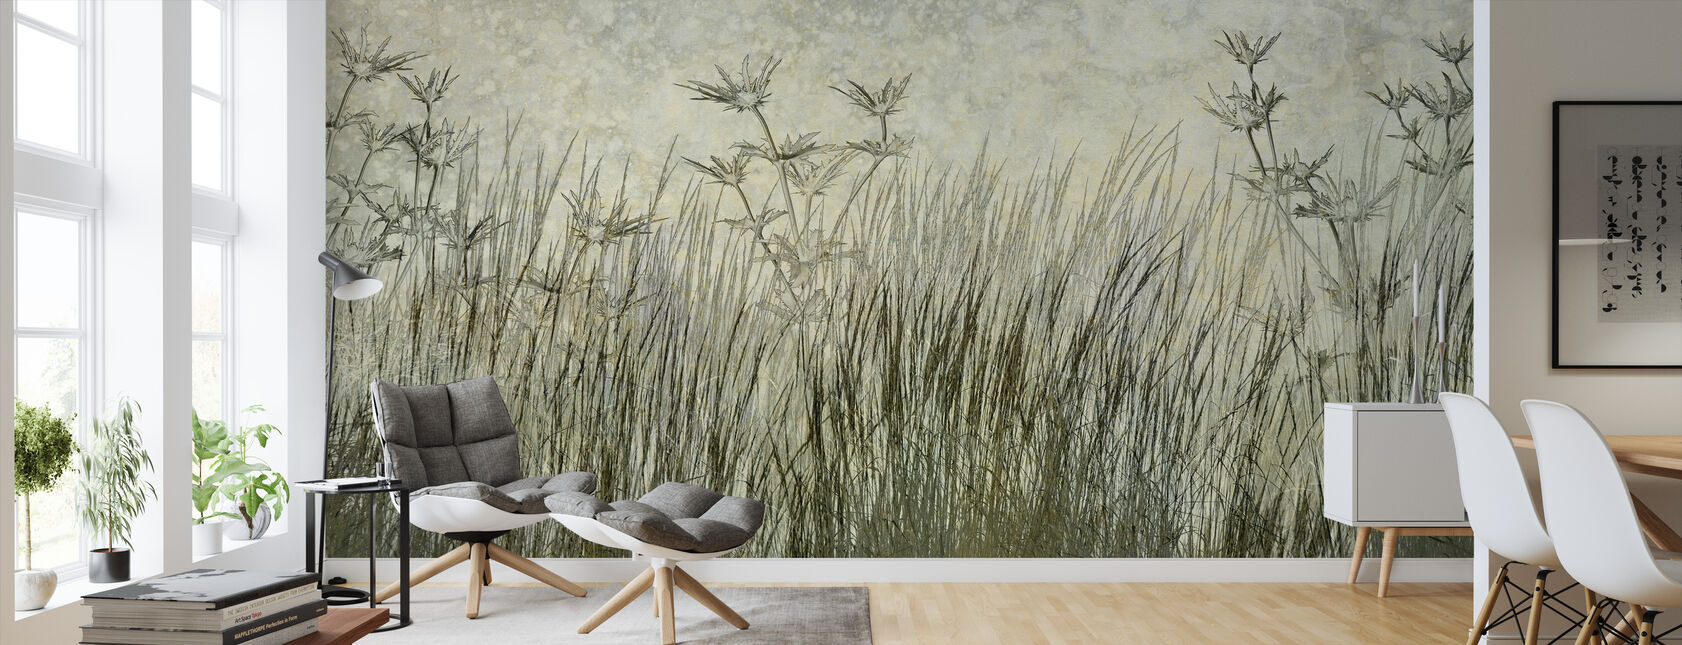 Dark Green Grass Silhouette - Wallpaper - Living Room